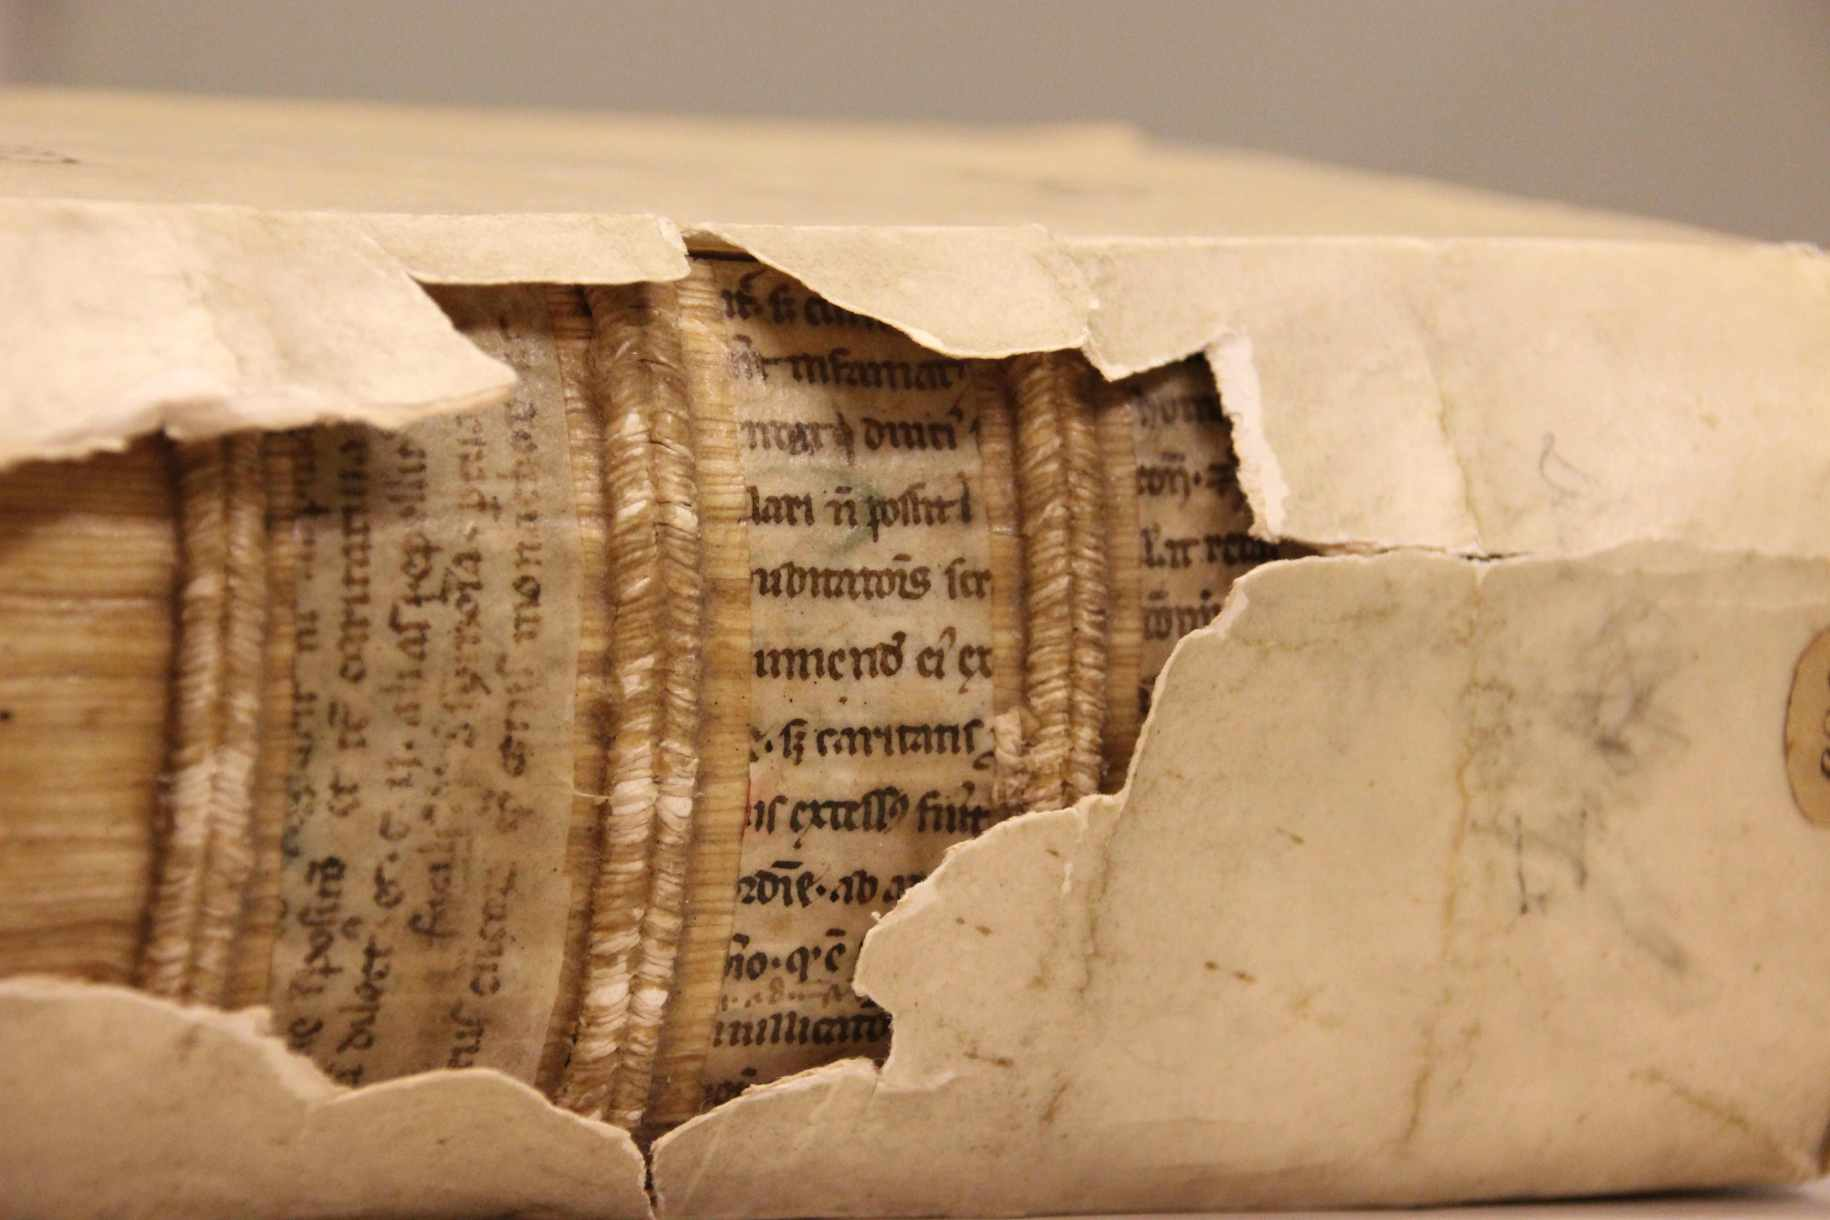 Damaged binding in Leiden University Library shows hidden fragment. Photo by Erik Kwakkel.